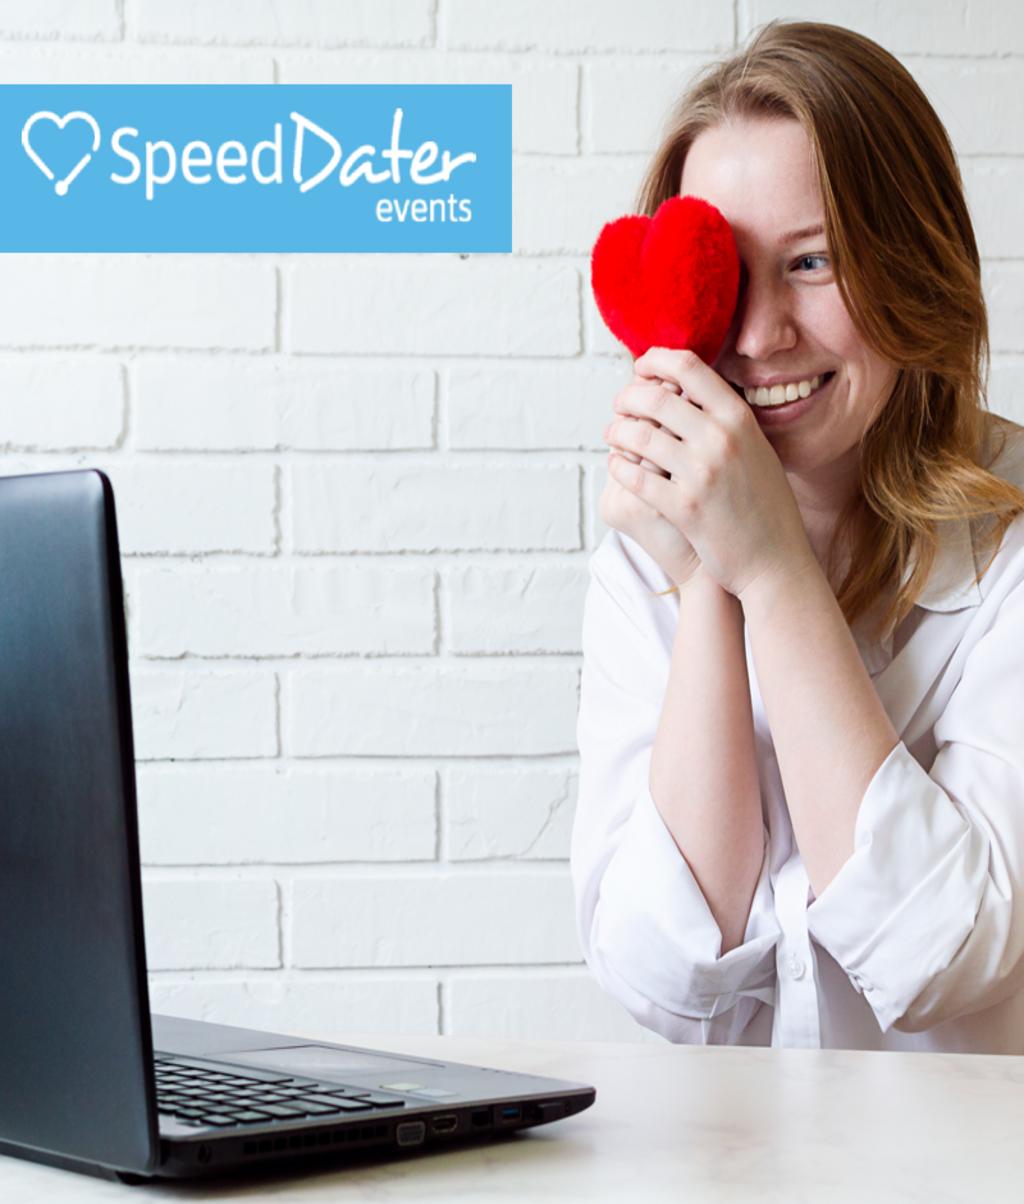 Speed dating leeds 18 25